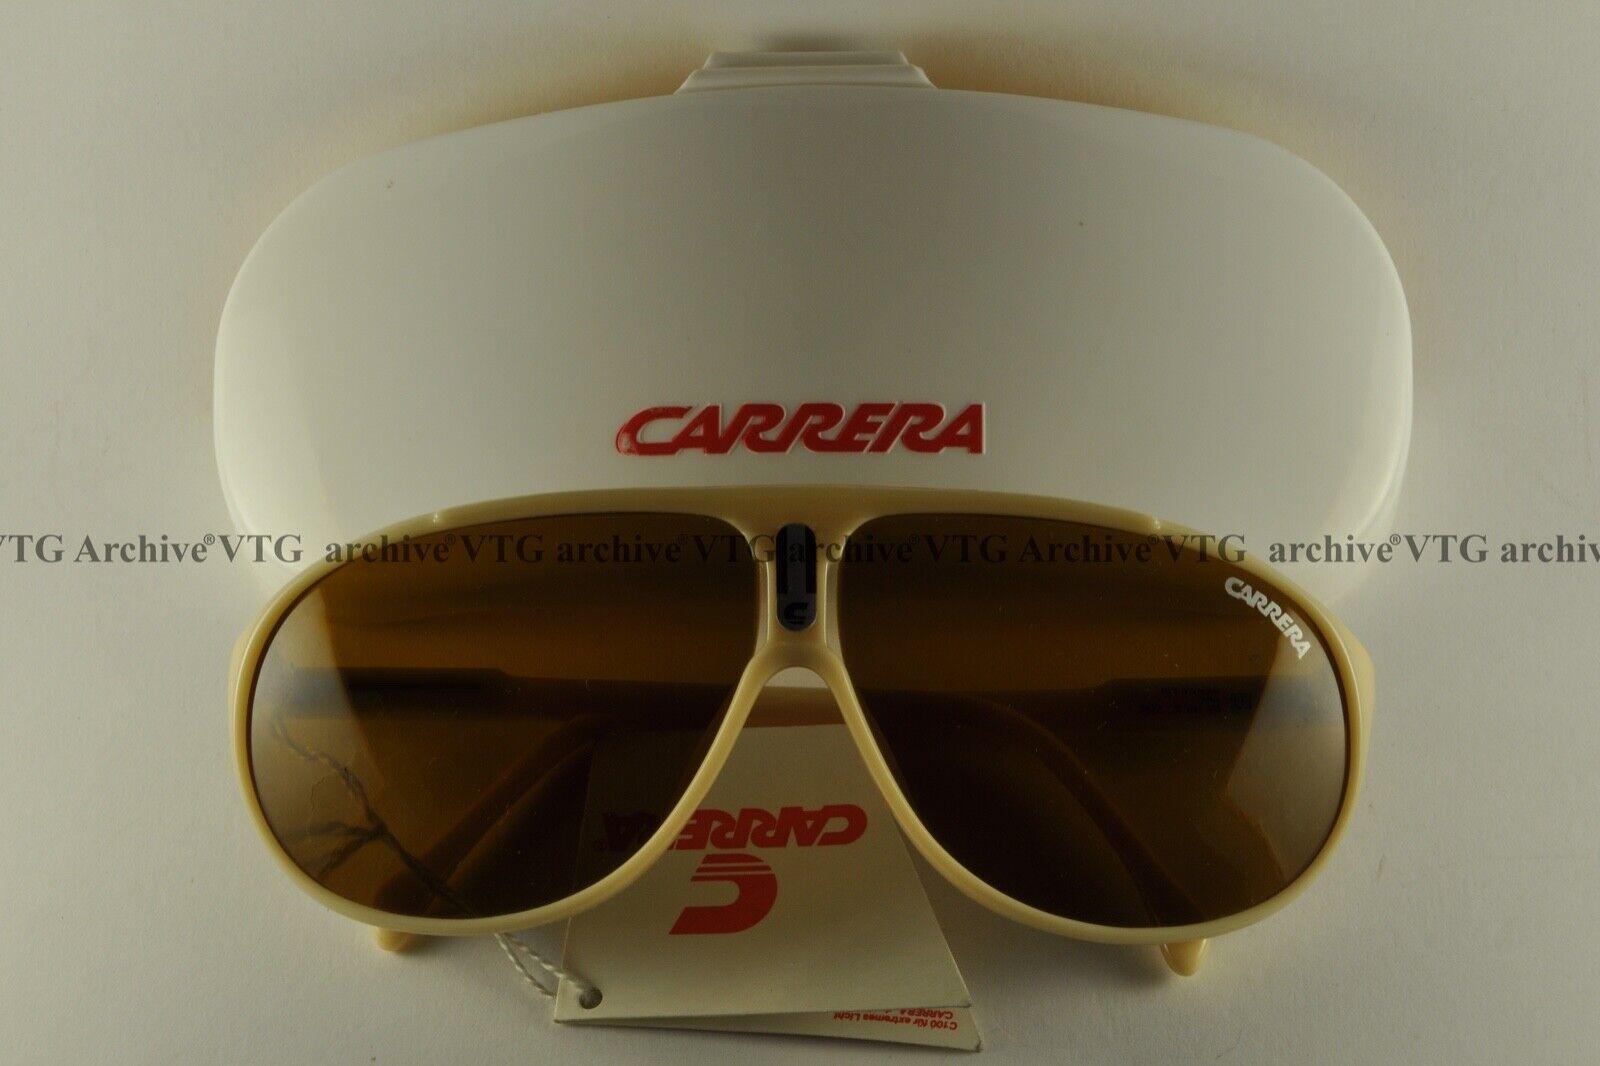 NOS Vintage Sunglasses Carrera 5412 aviator sky snow size 60[ ]16 Germany medium